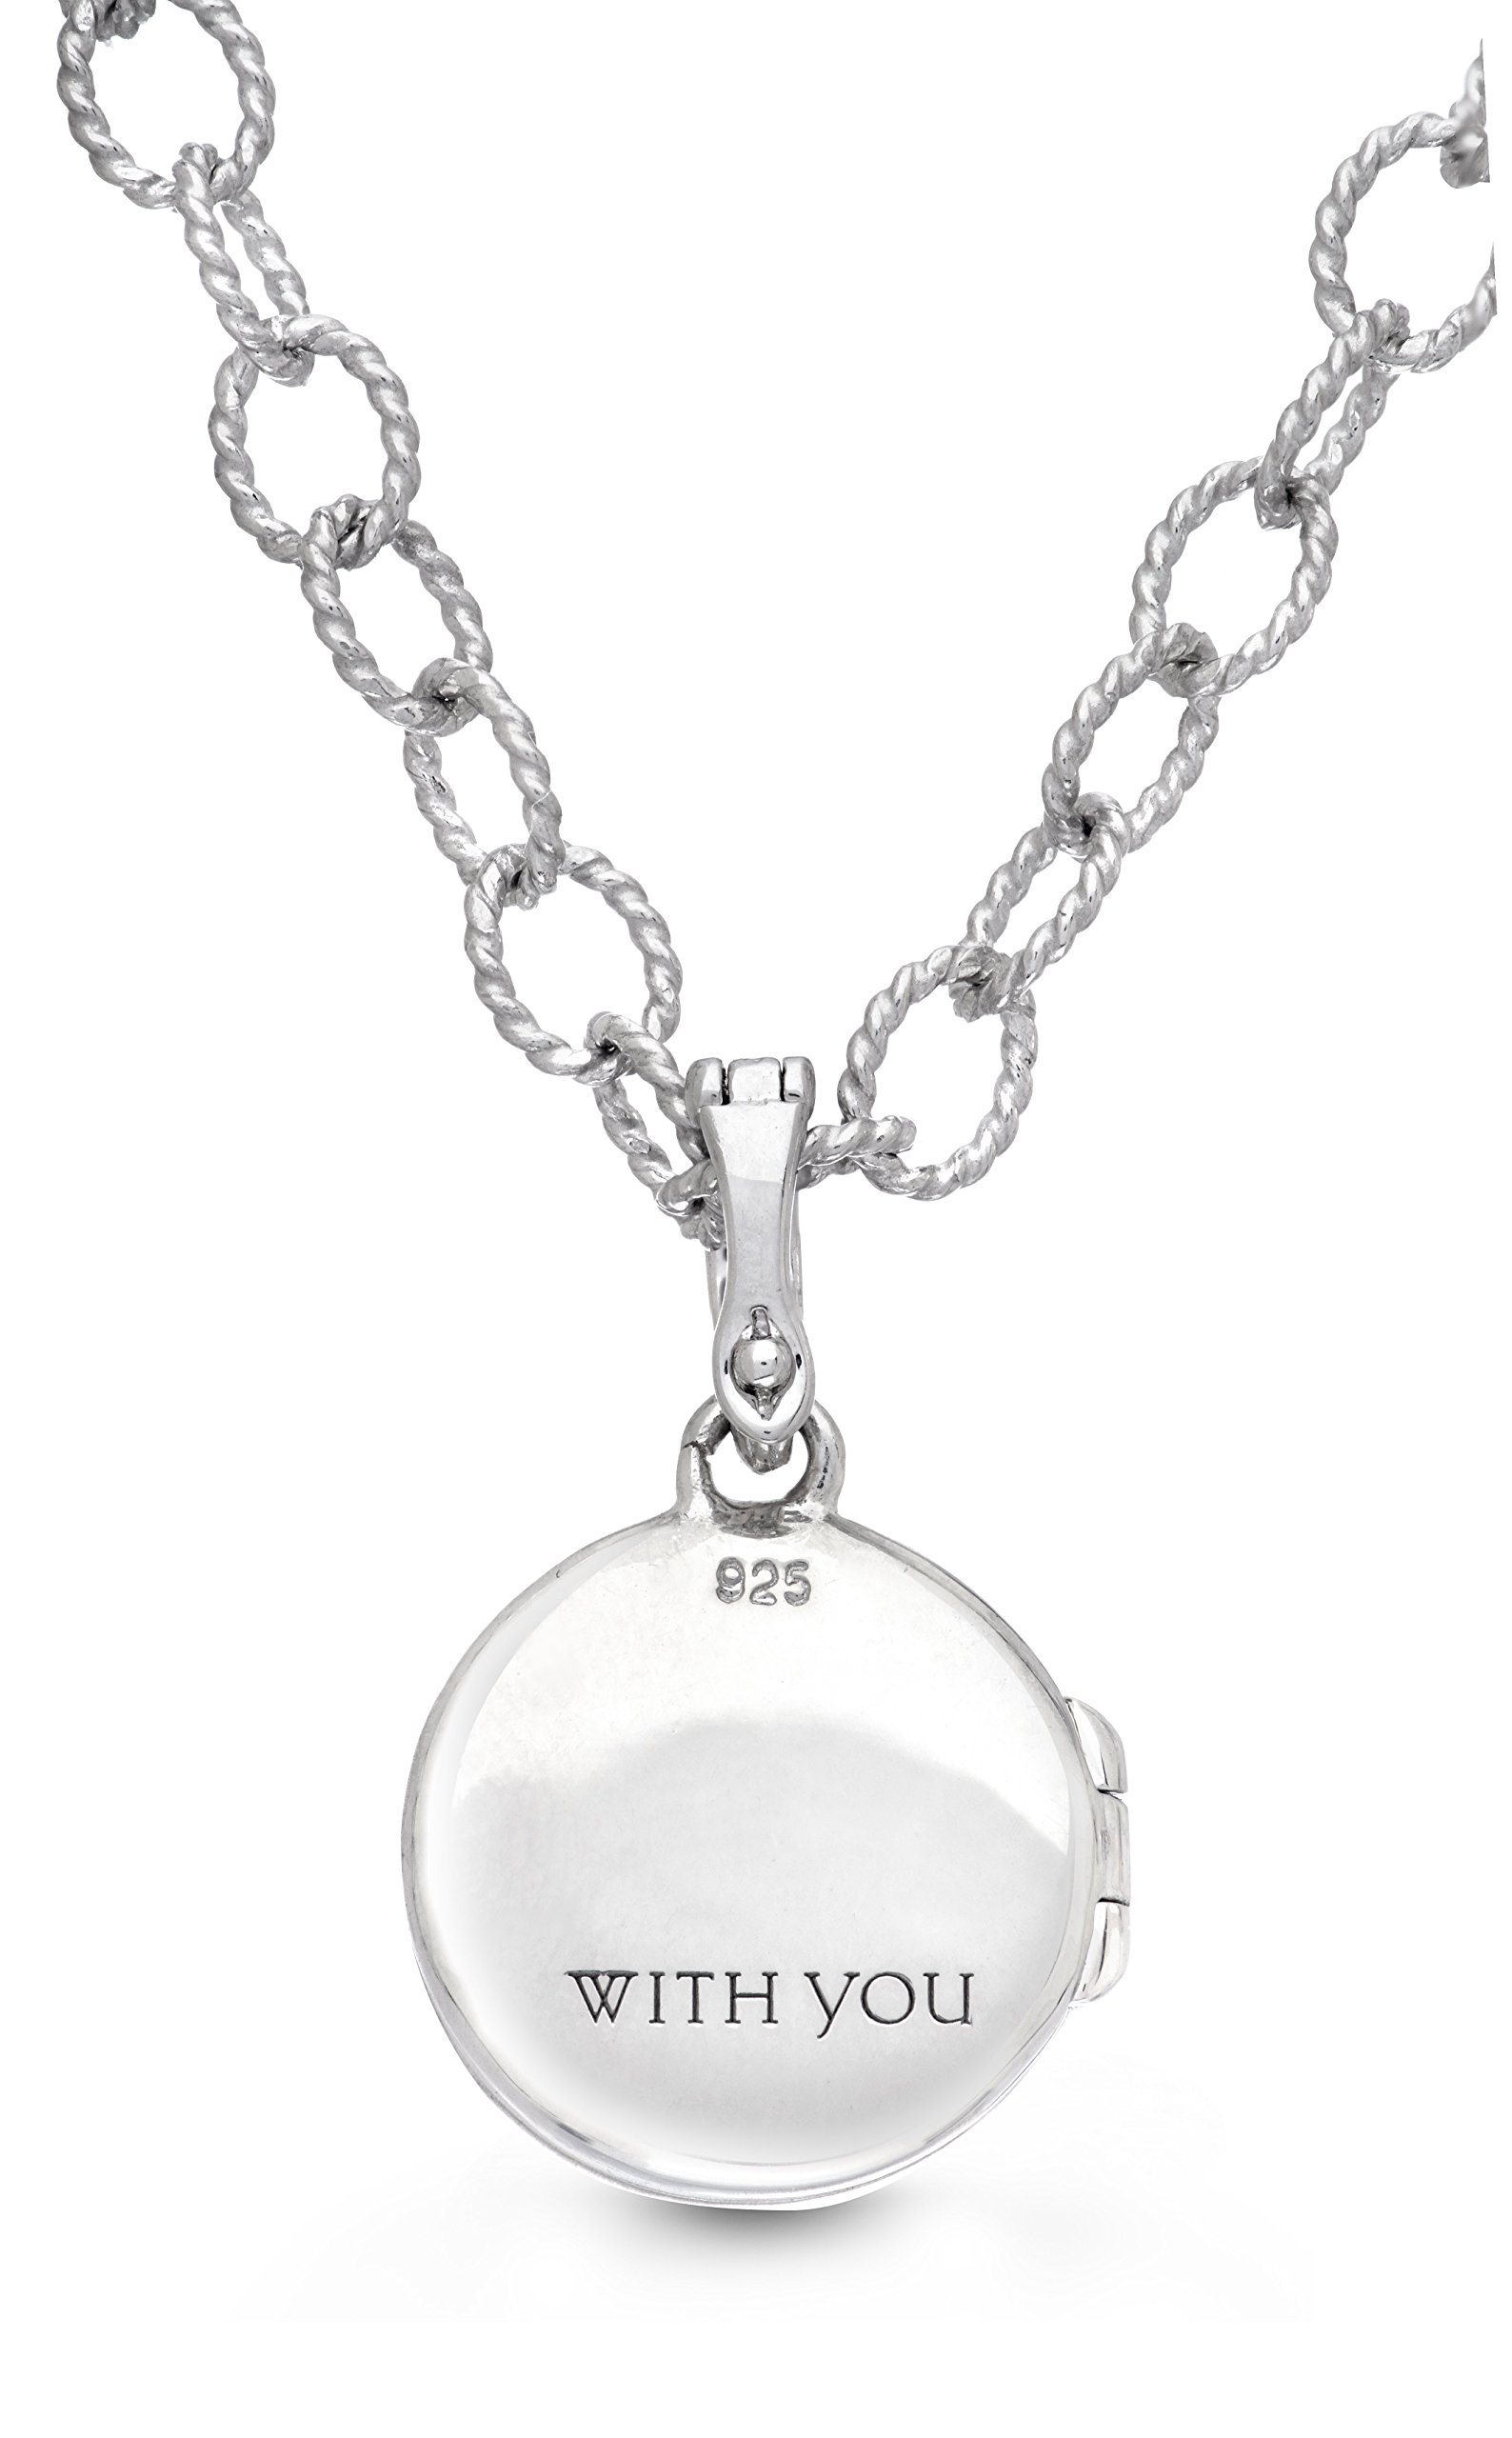 Sterling Silver Oxidized White Topaz Round Locket Bracelet/Anklet The Roxy by With You Lockets